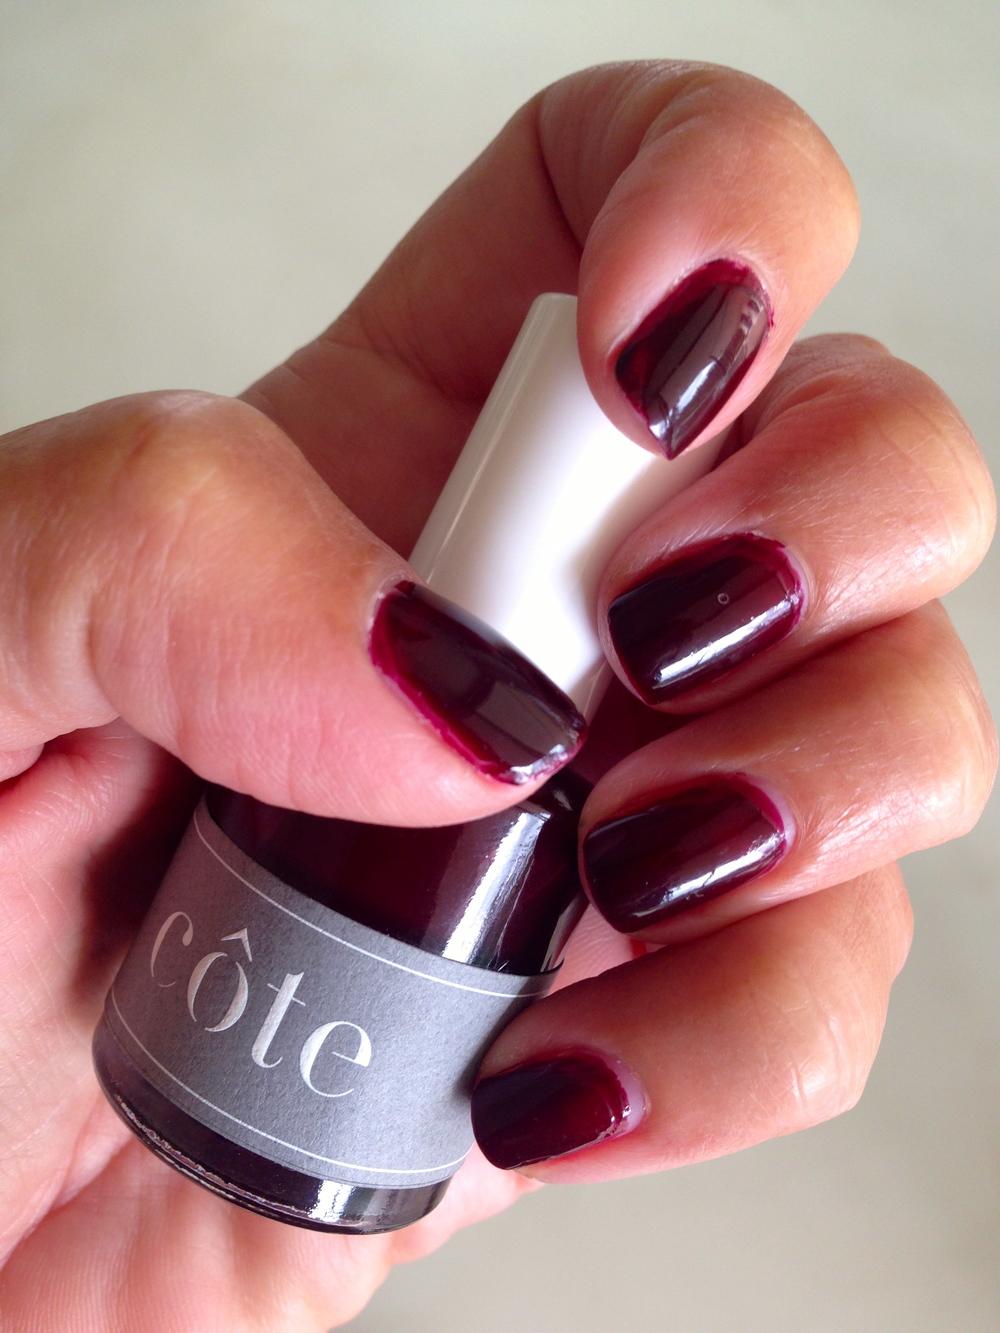 côte polish No. 38 (oxblood).